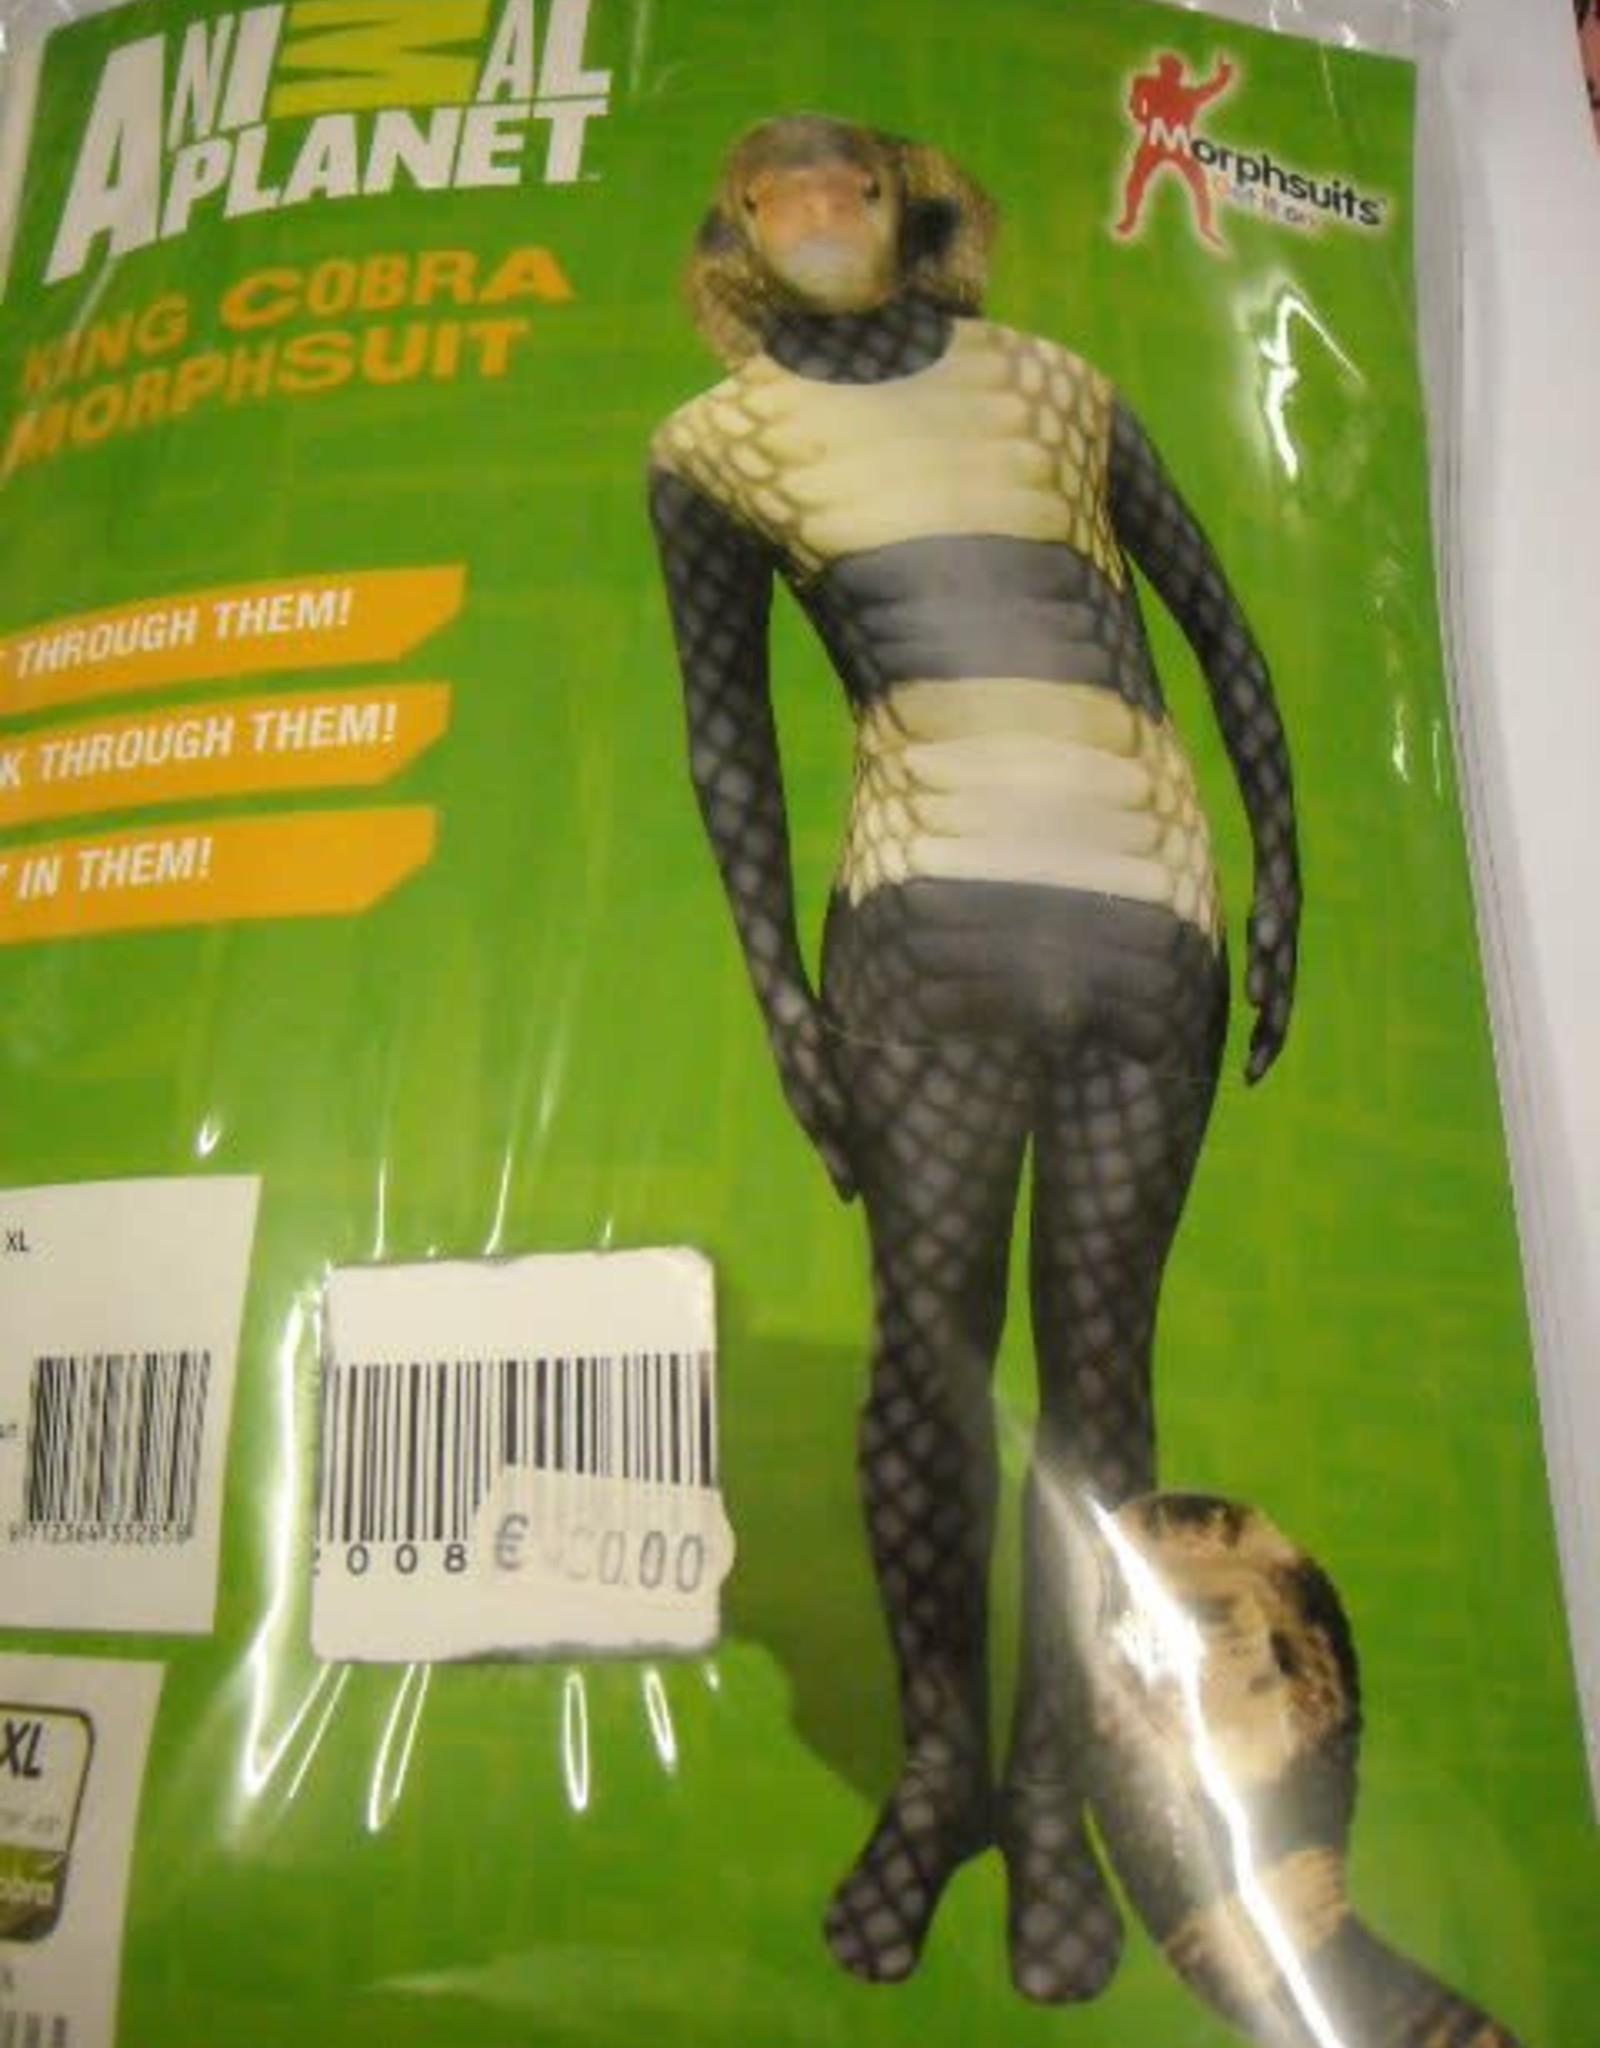 ESPA morphsuits cobra